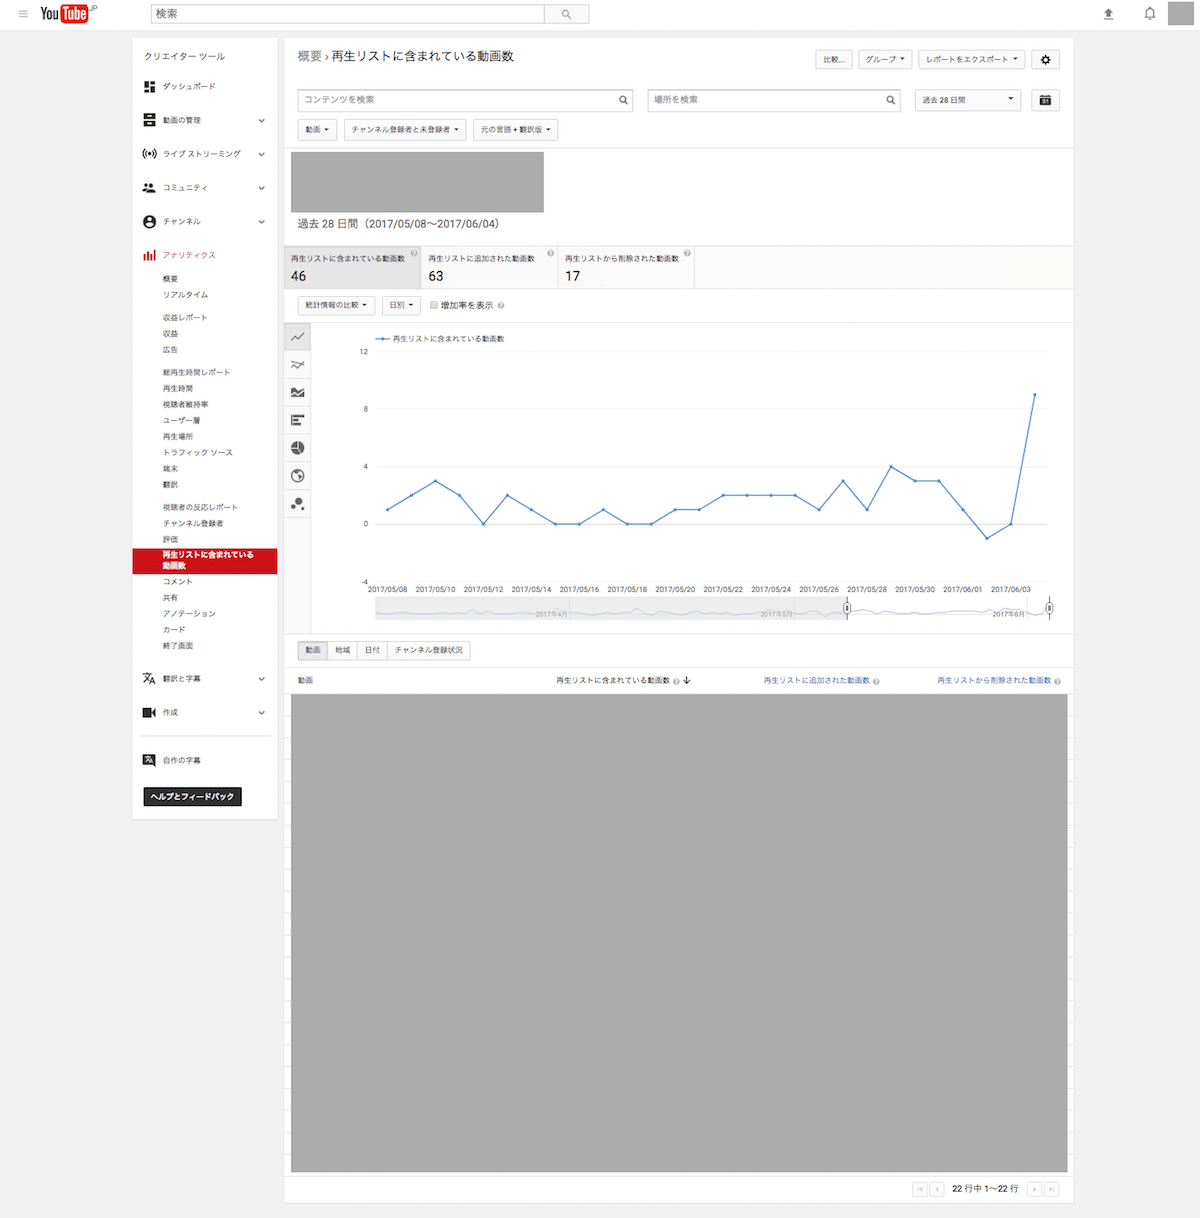 YA10 min YouTubeアナリティクスの使い方【初心者でもわかる!】